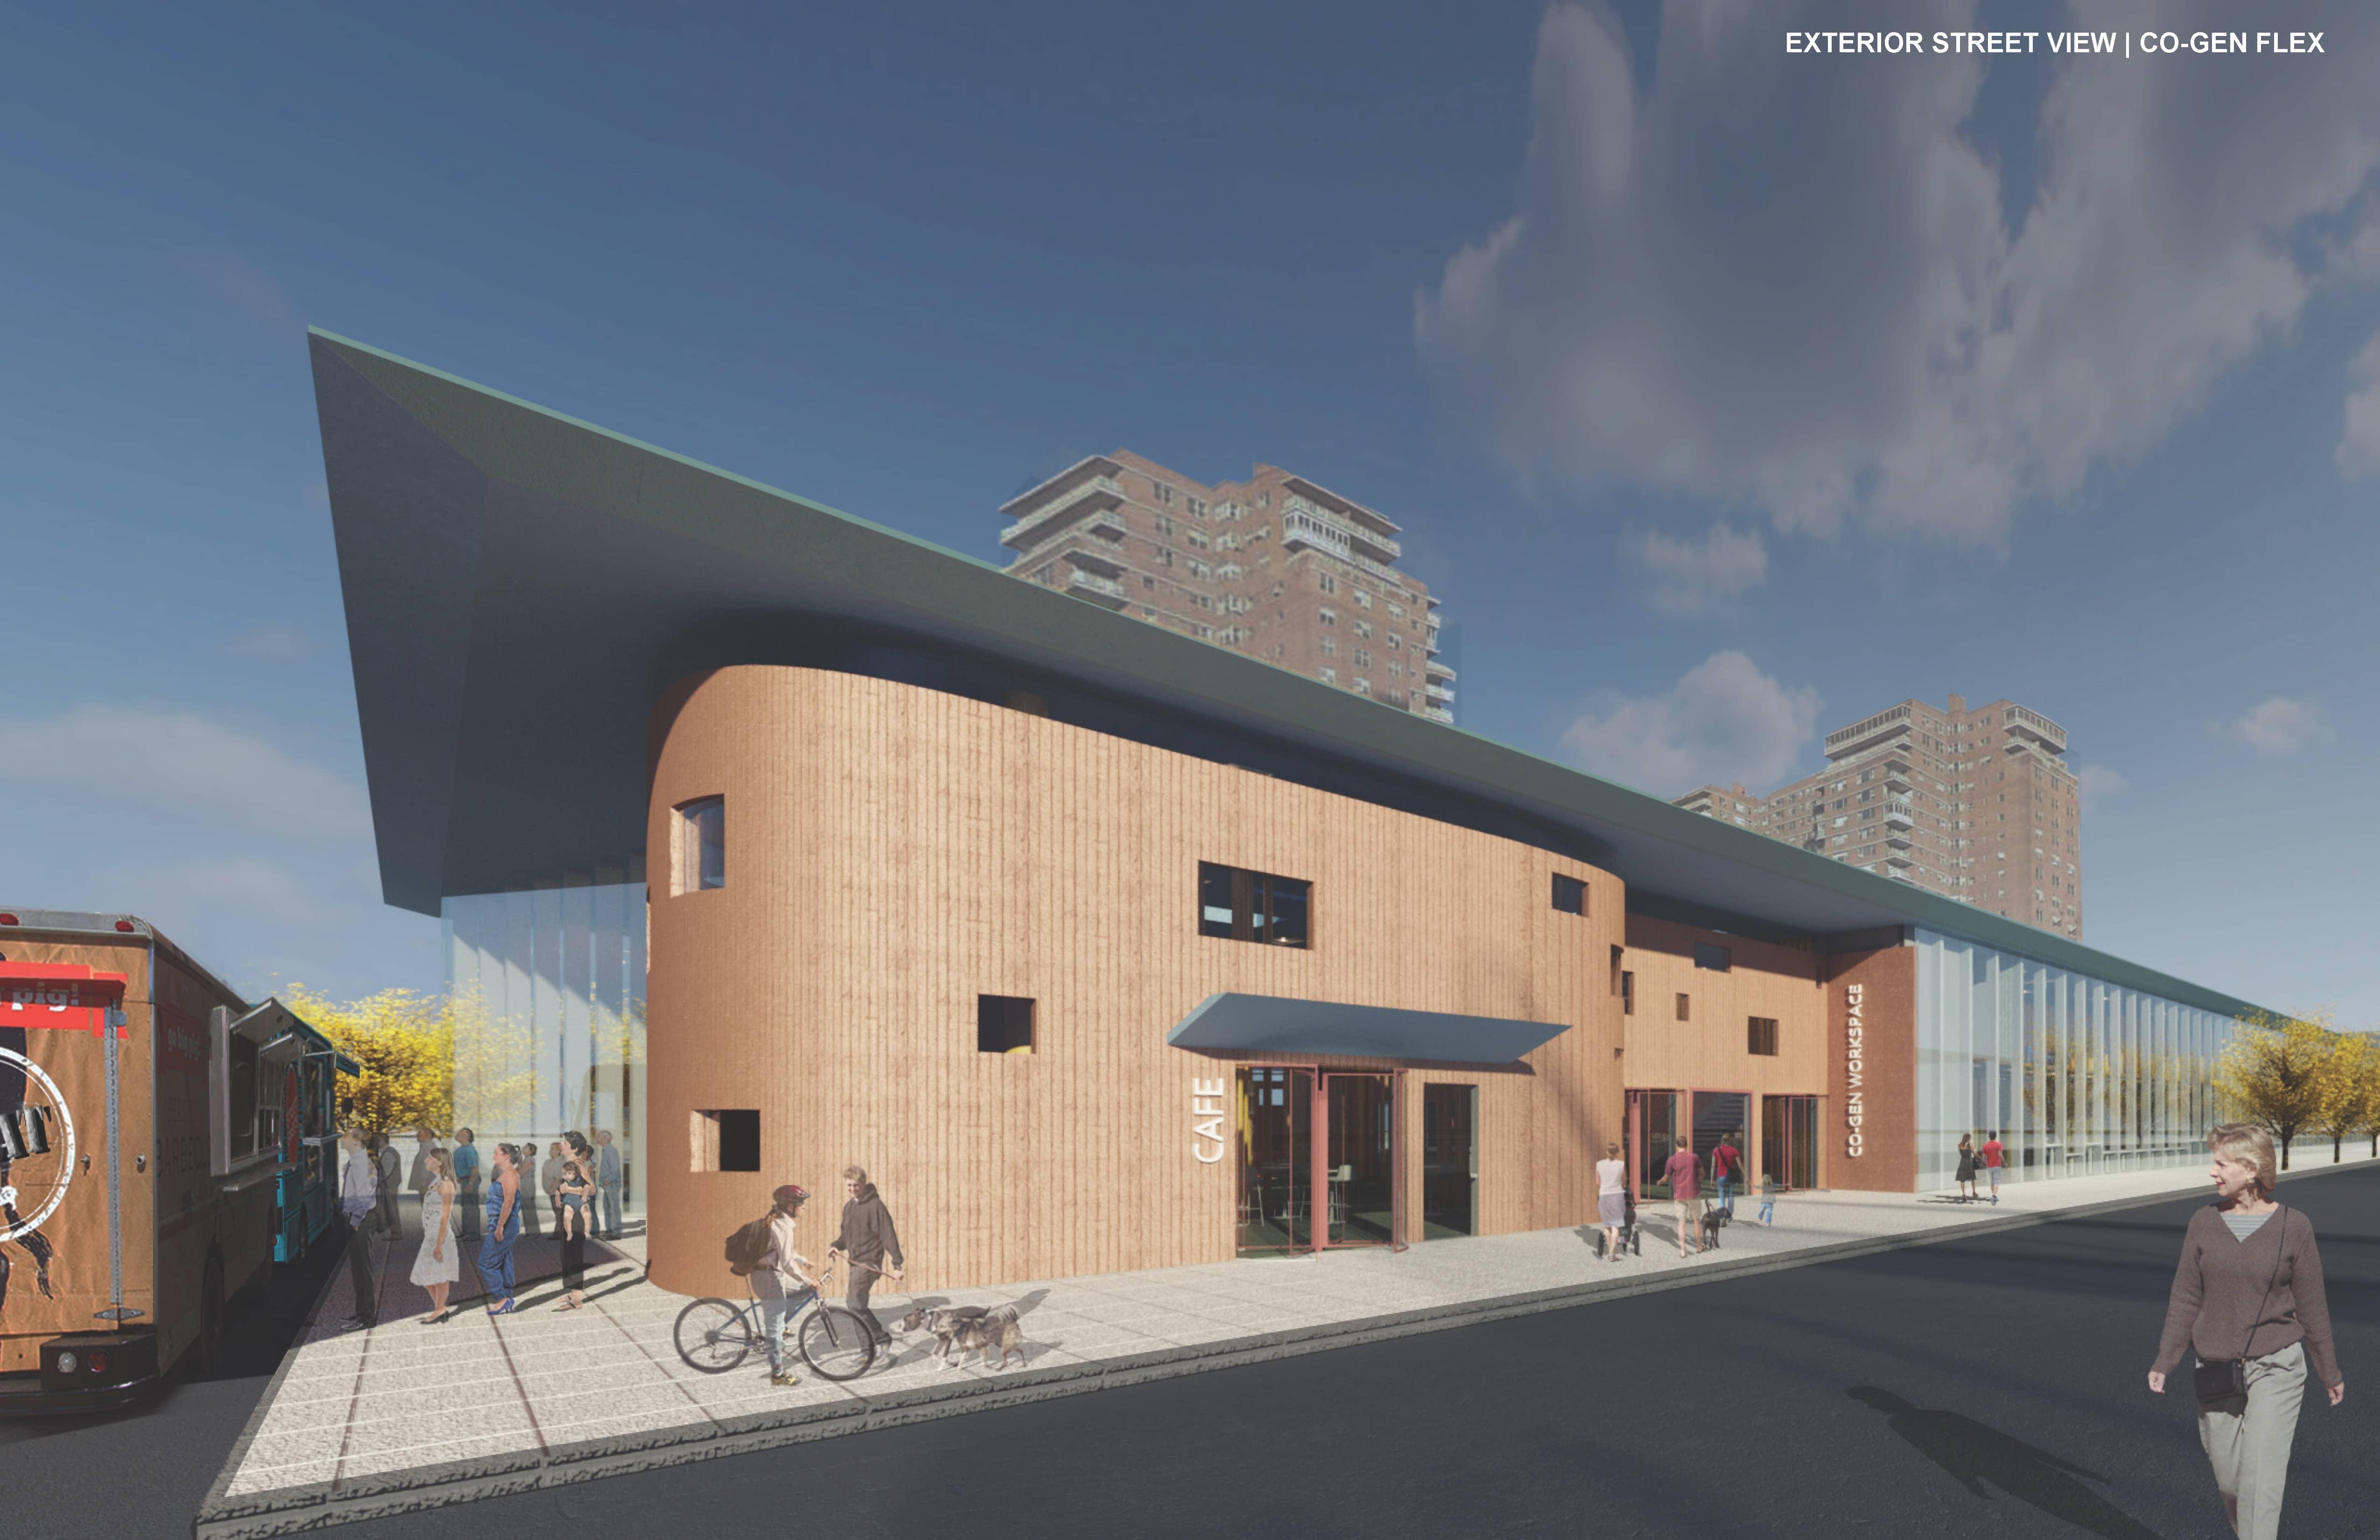 Exterior rendering of retail building.